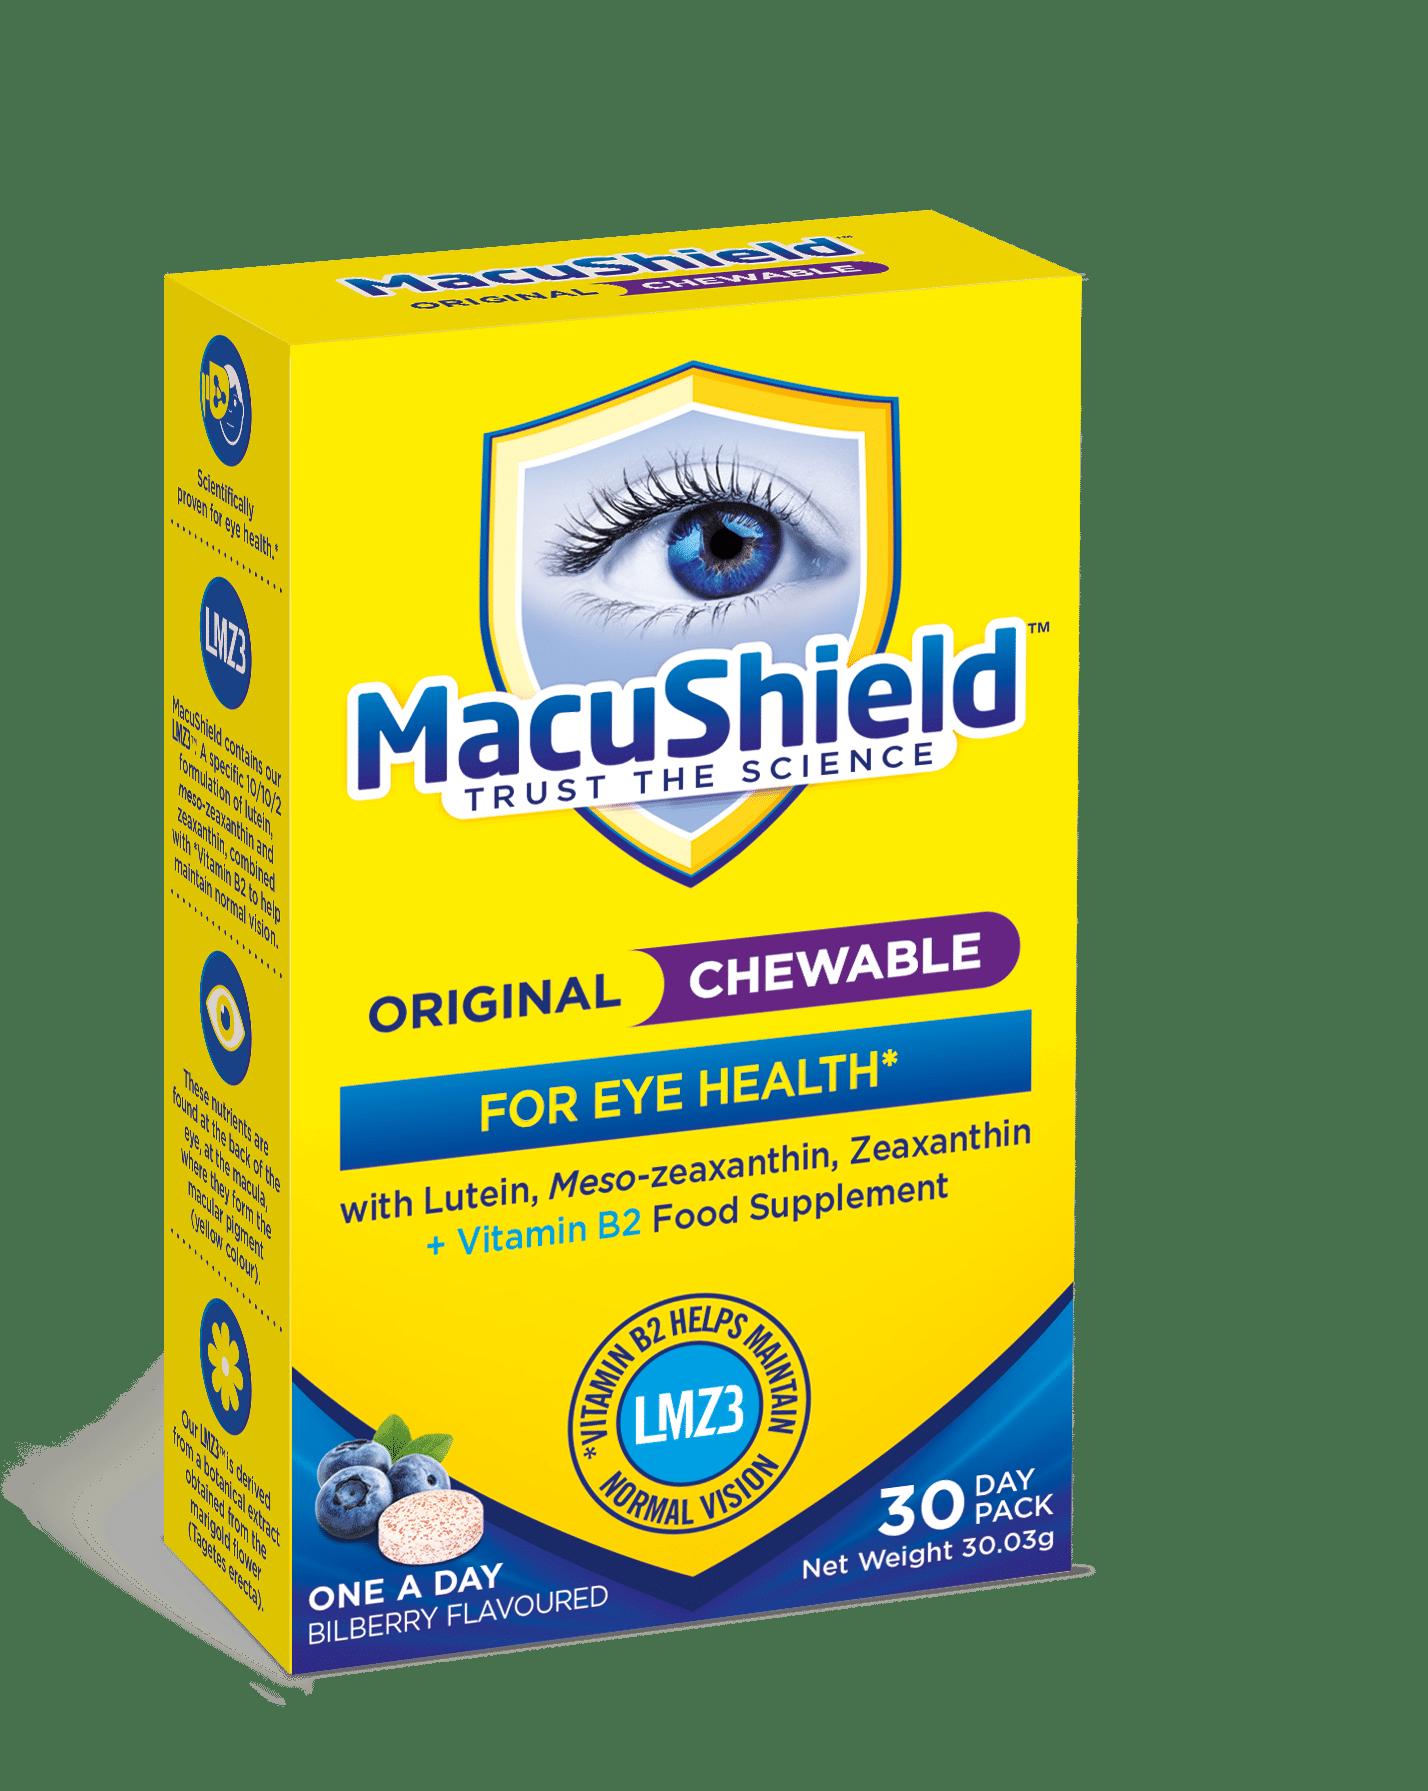 MacuShield Chewable